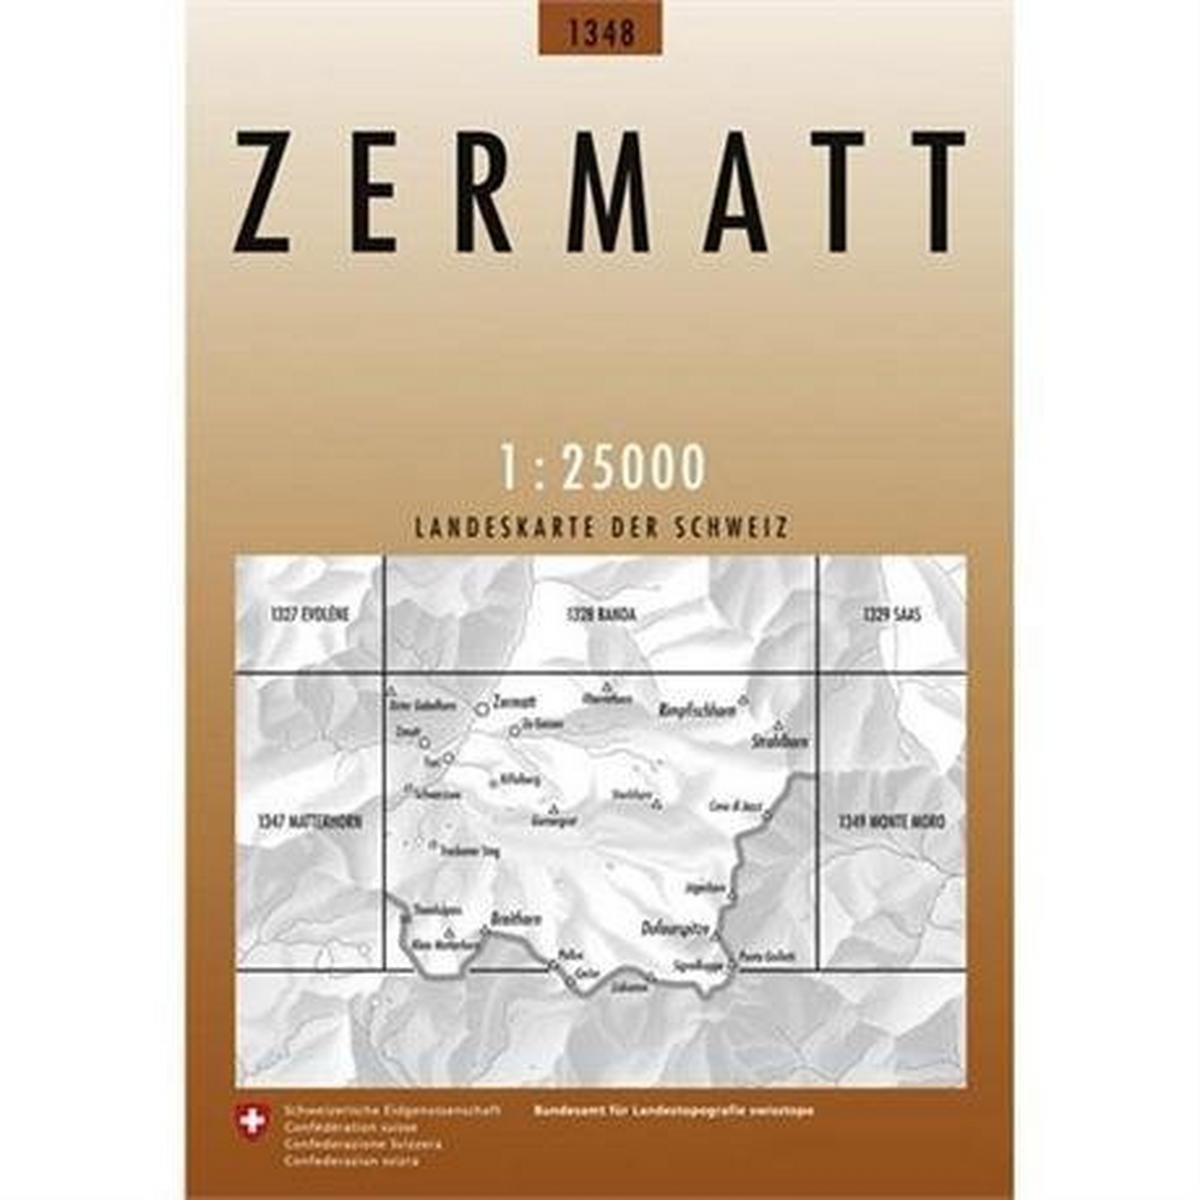 Miscellaneous Switzerland Map 1348 Zermatt